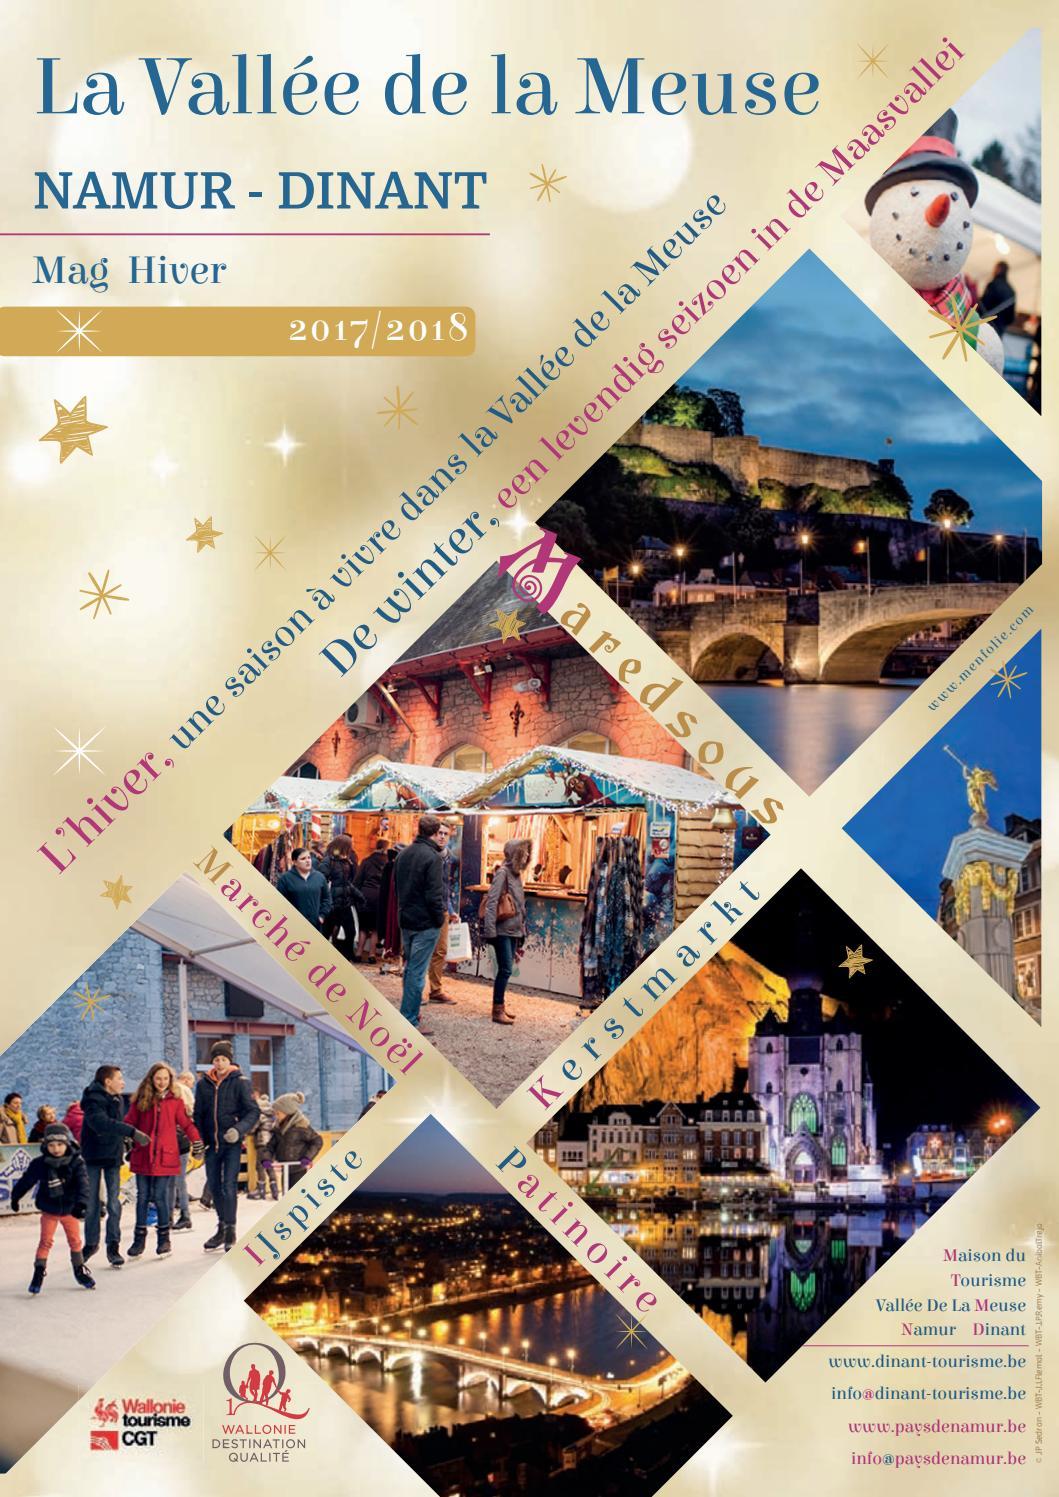 Mag hiver vall e de la meuse namur dinant by maison du tourisme vall e de la meuse namur - Office du tourisme dinant ...